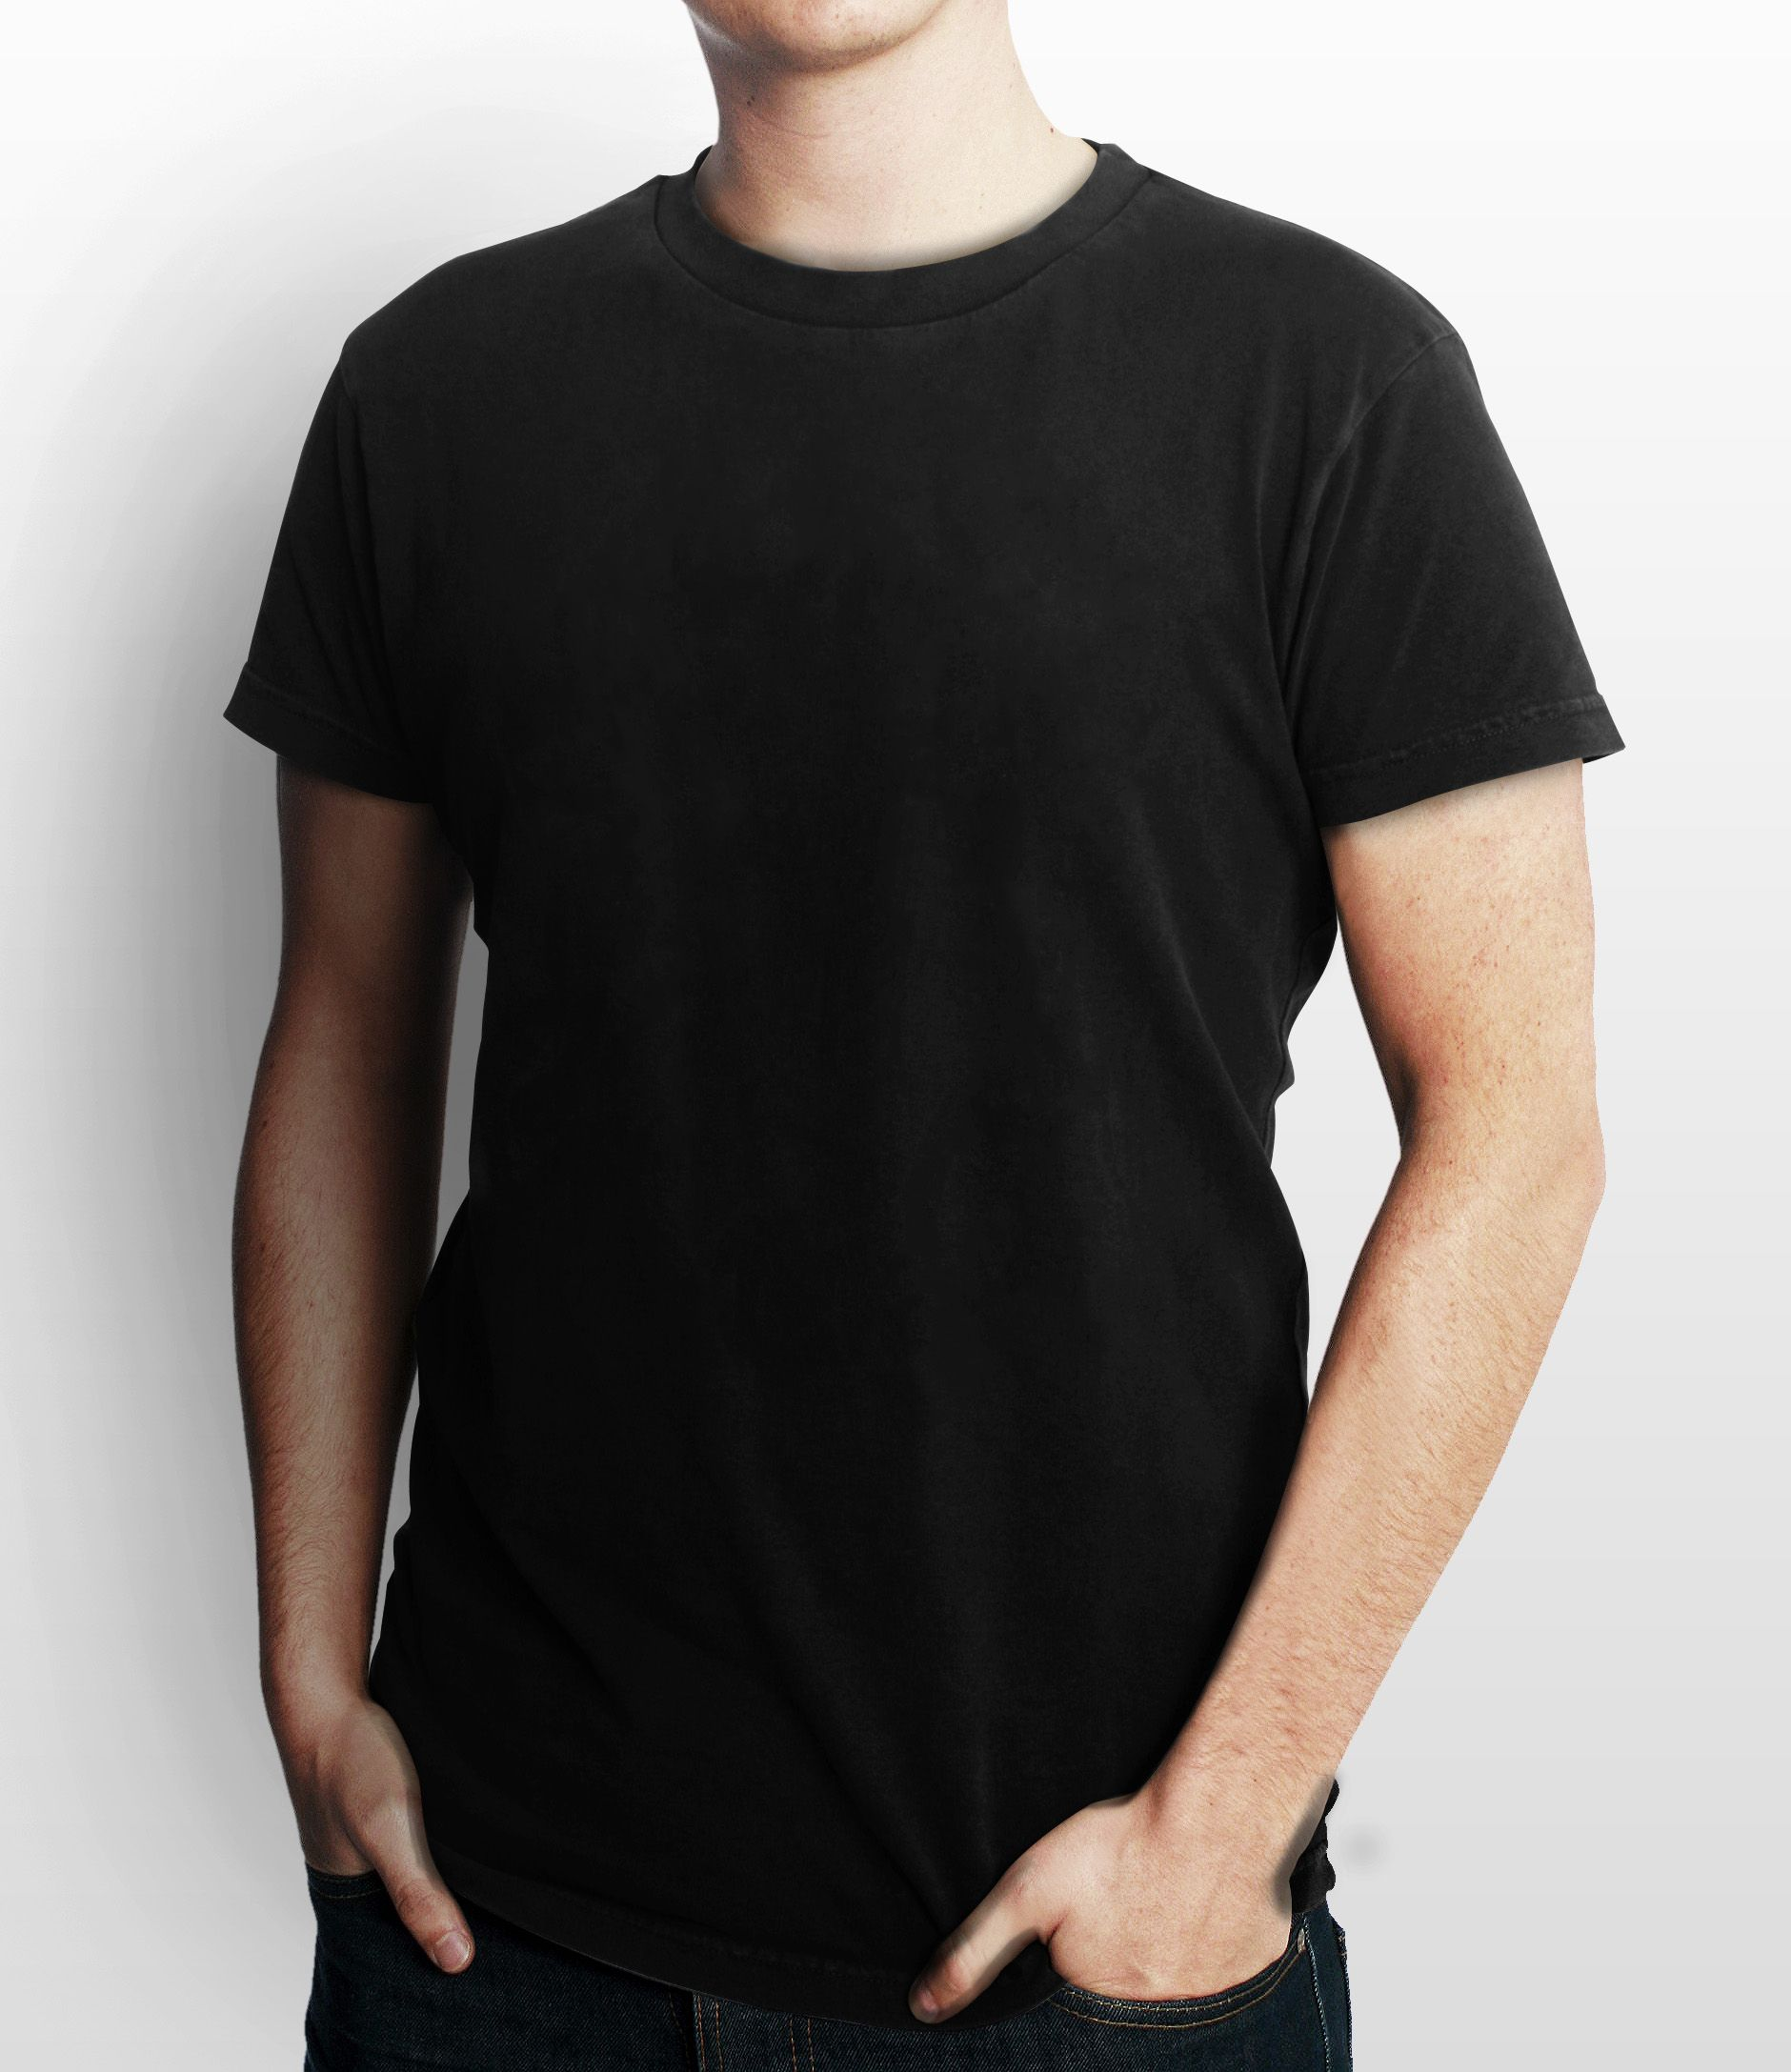 Kaos Polos Black Bahan Cotton Harga Uk Ss 15000 S M Tendencies Short Shirt Grey Stripe Pocket Abu Muda L